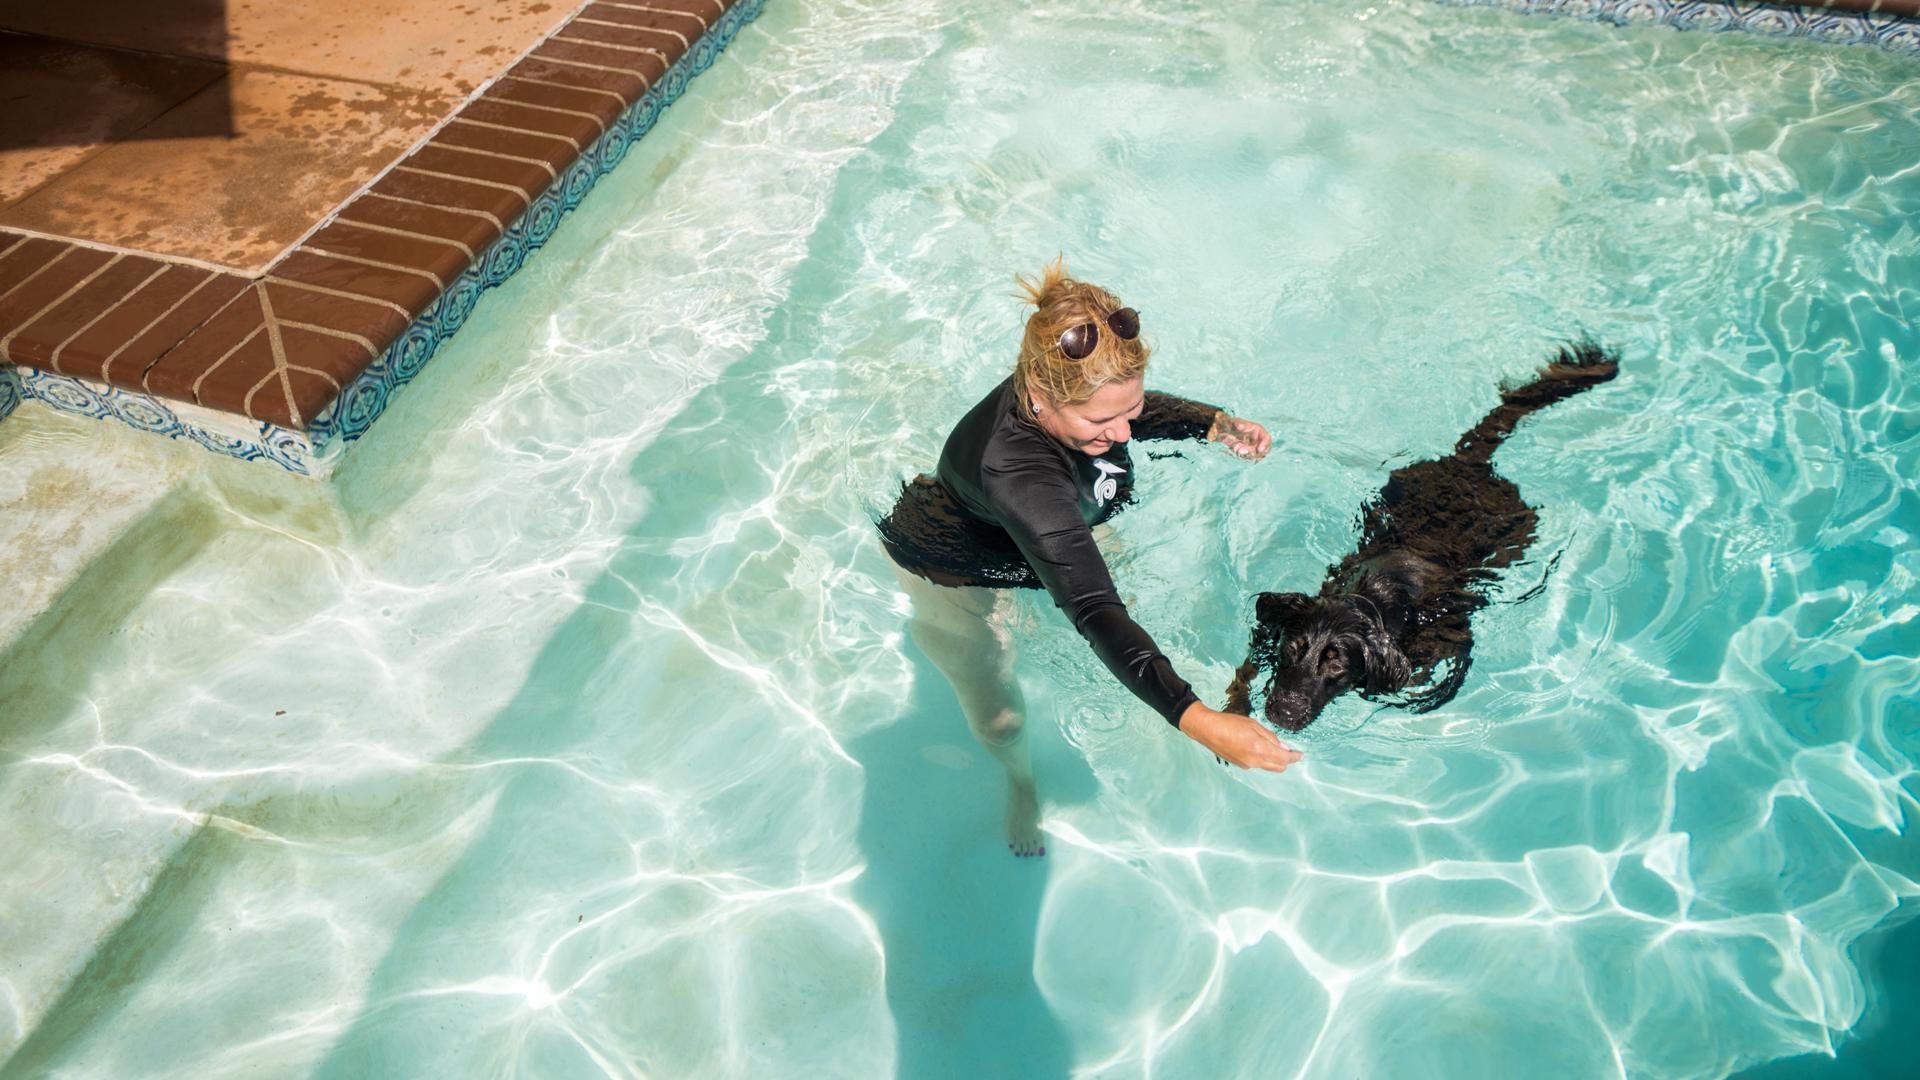 Retriever learning to swim